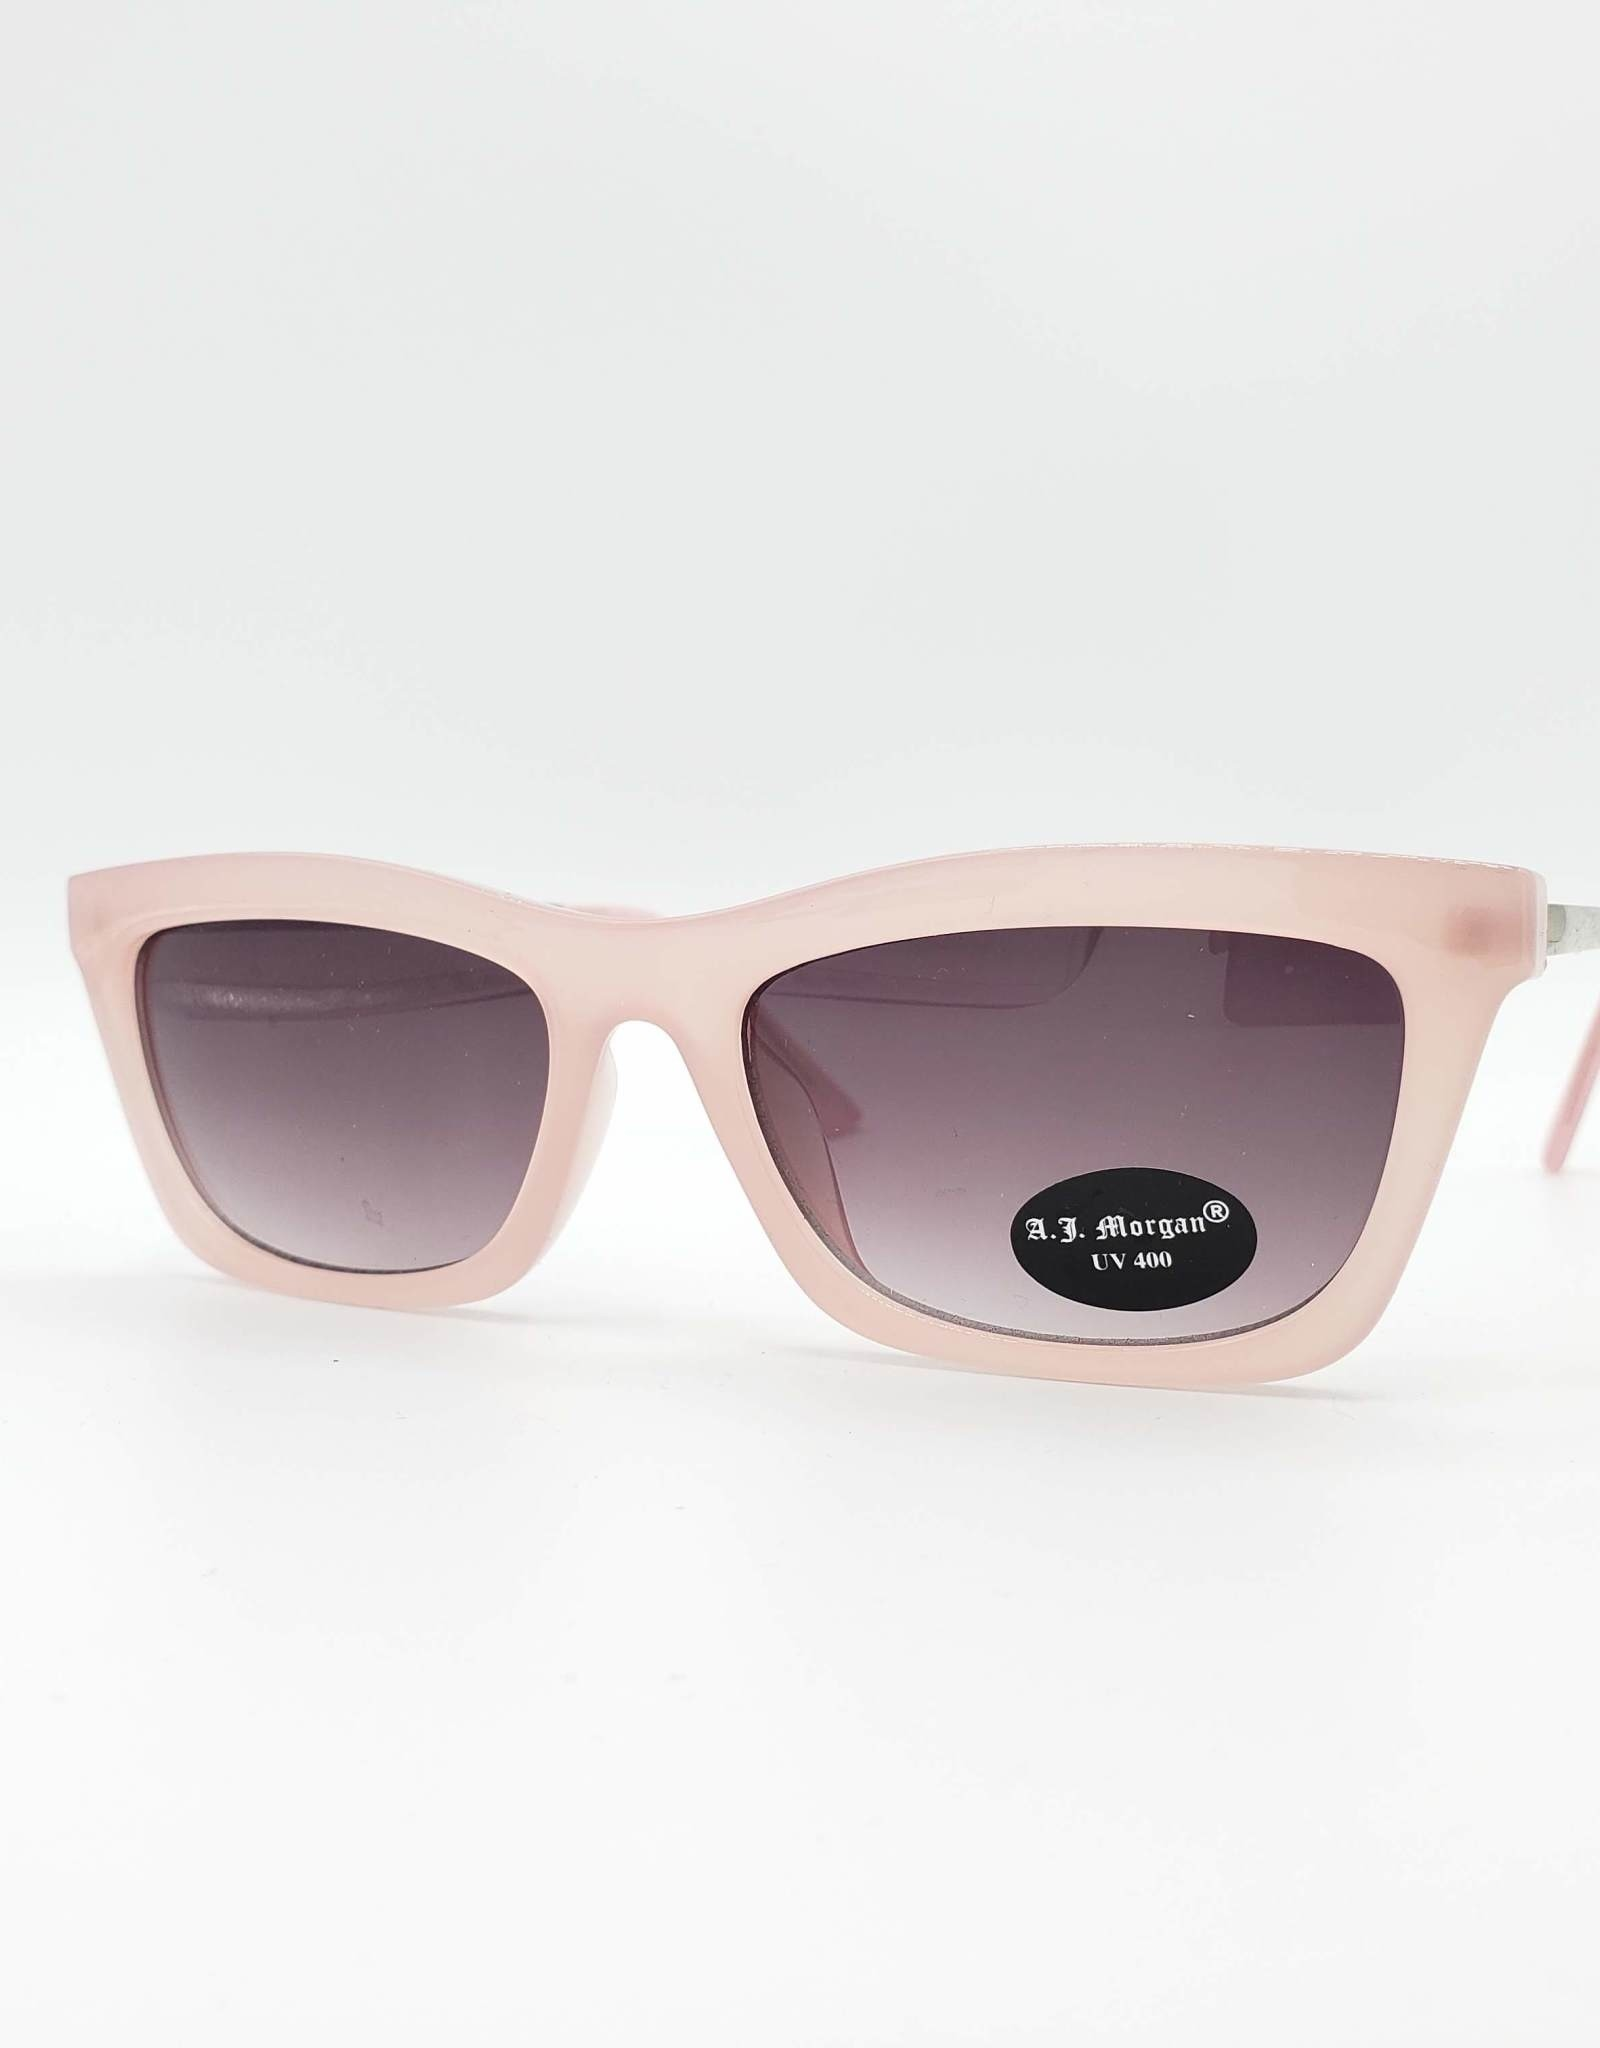 AJ Morgan Bambi Pink Sunglasses, AJ Morgan